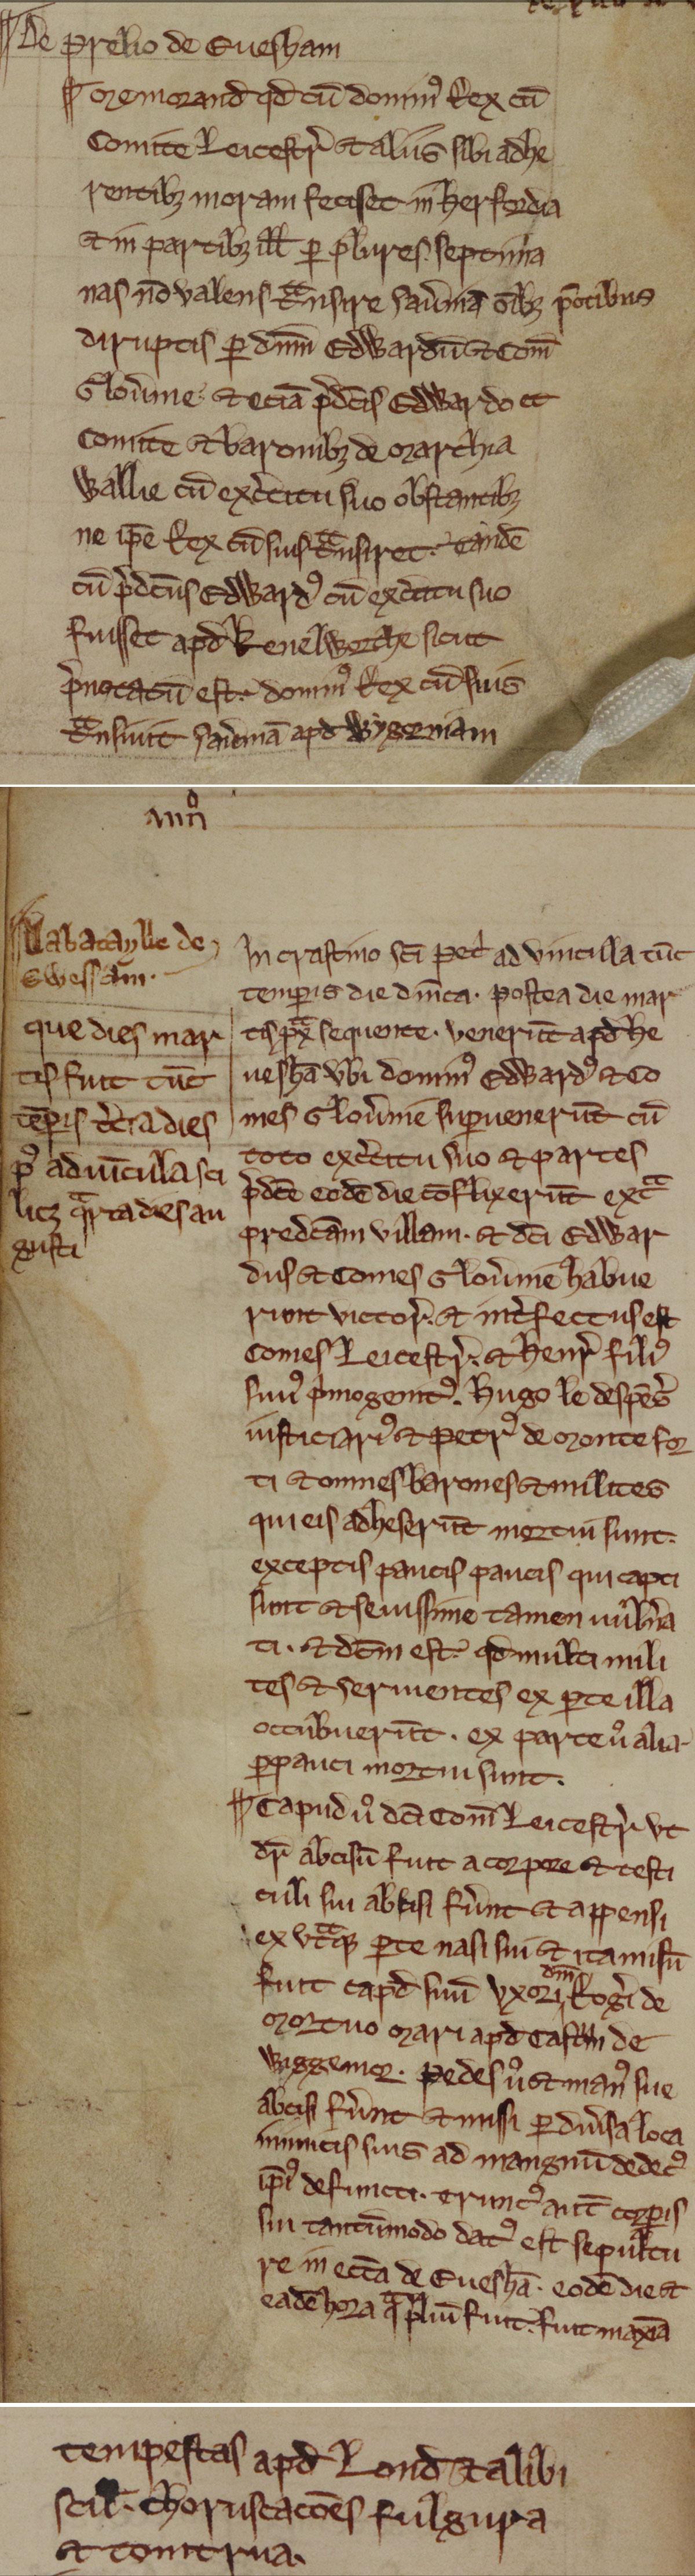 Battle of Evesham, 1265 (London Metropolitan Archive)